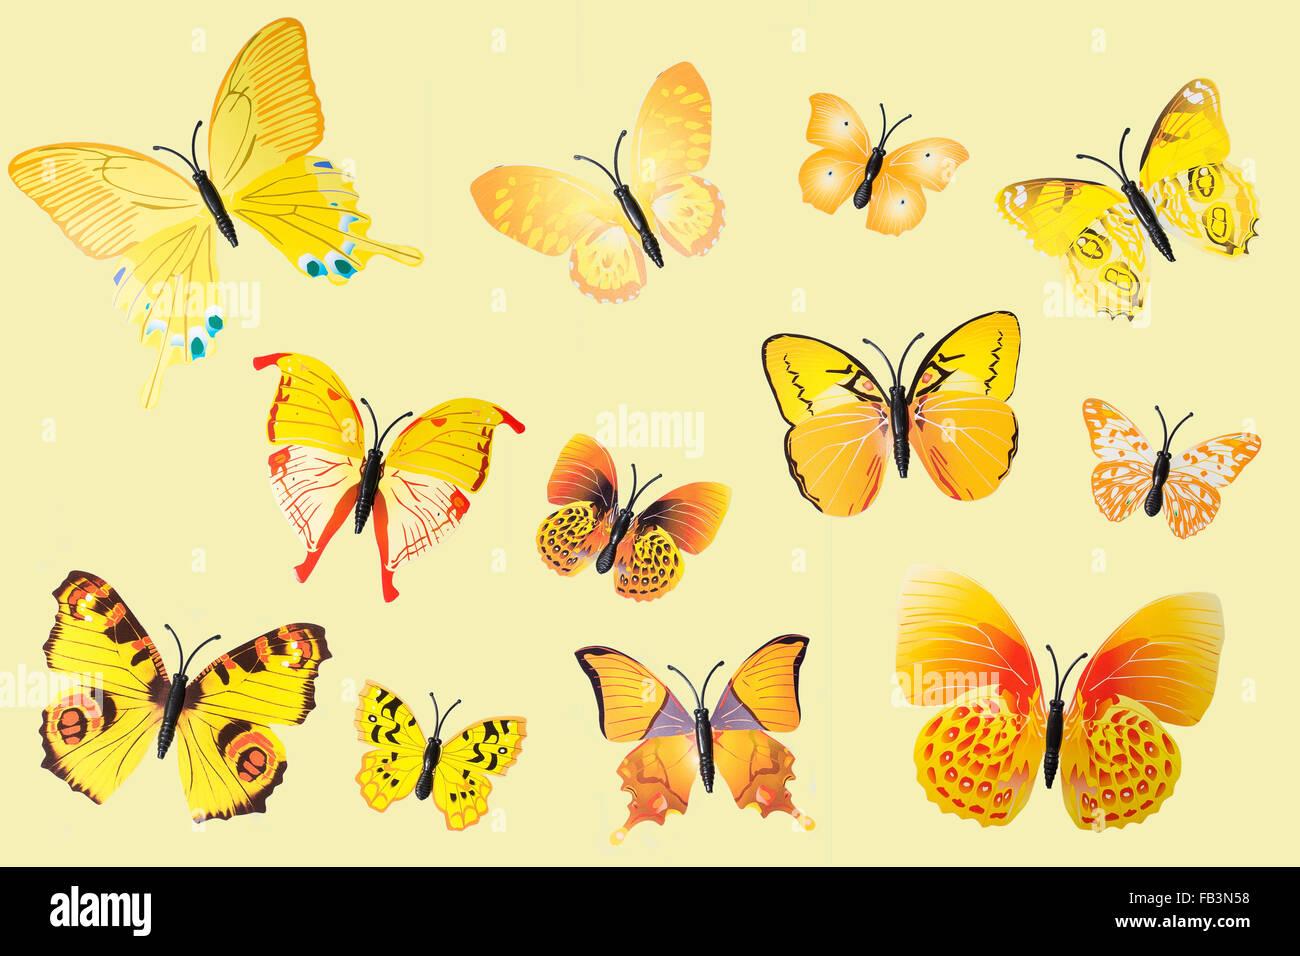 Collection de papillons fantaisie jaune Clip Art Photo Stock